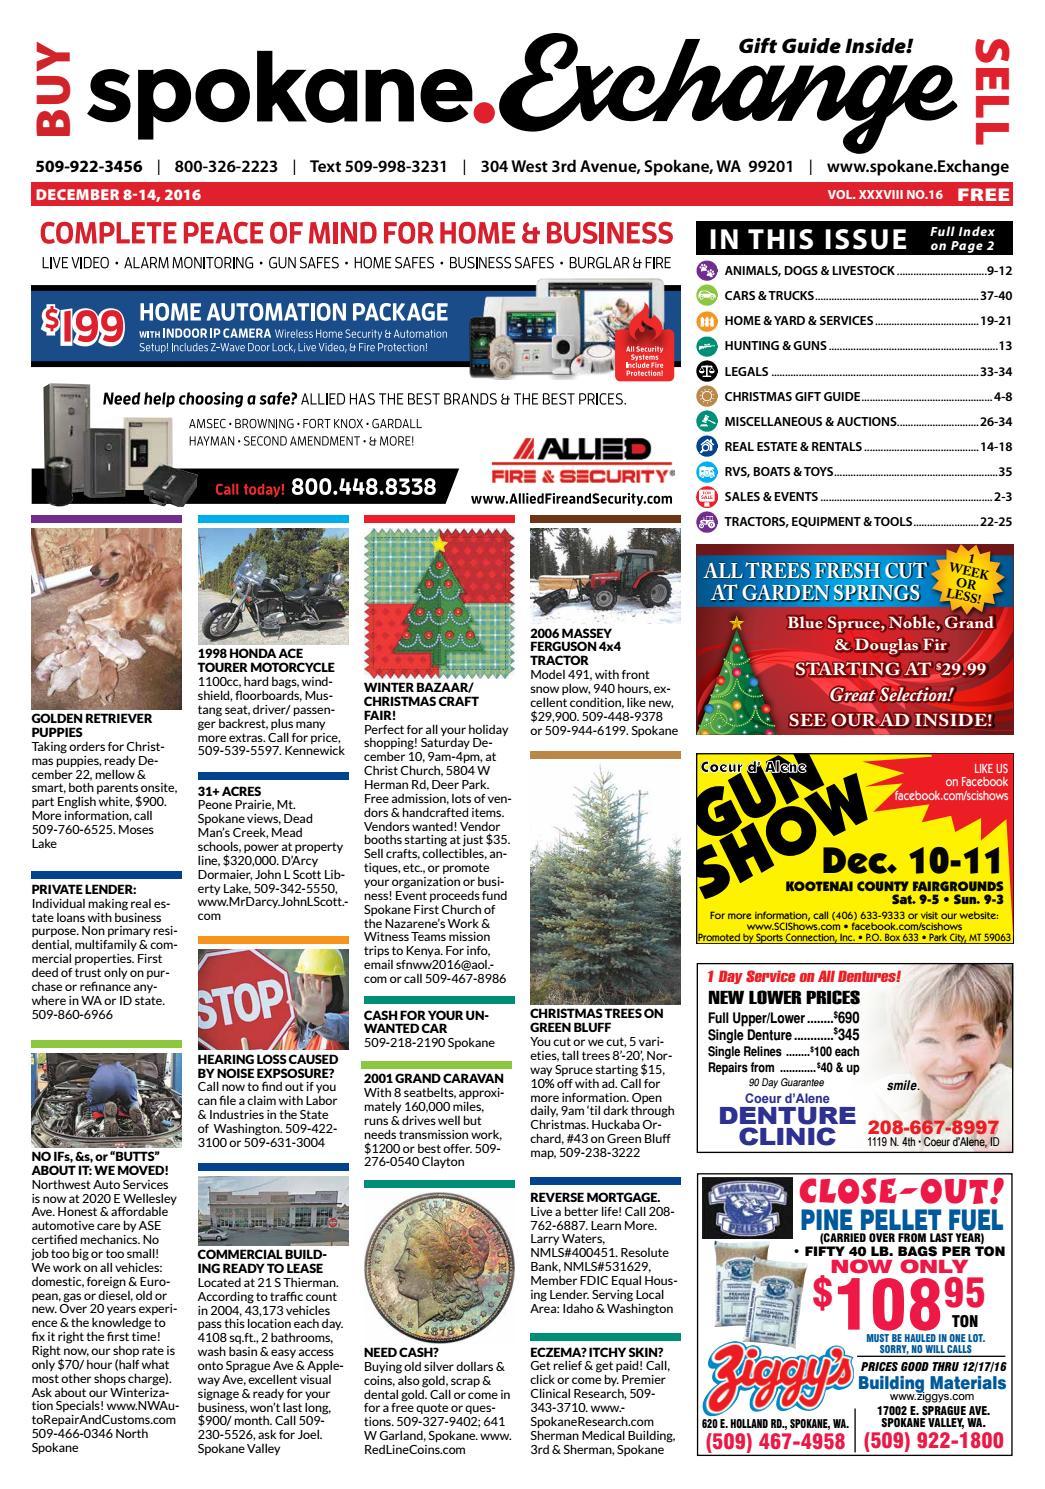 320 Bichon Frise return WATERPROOF address labels